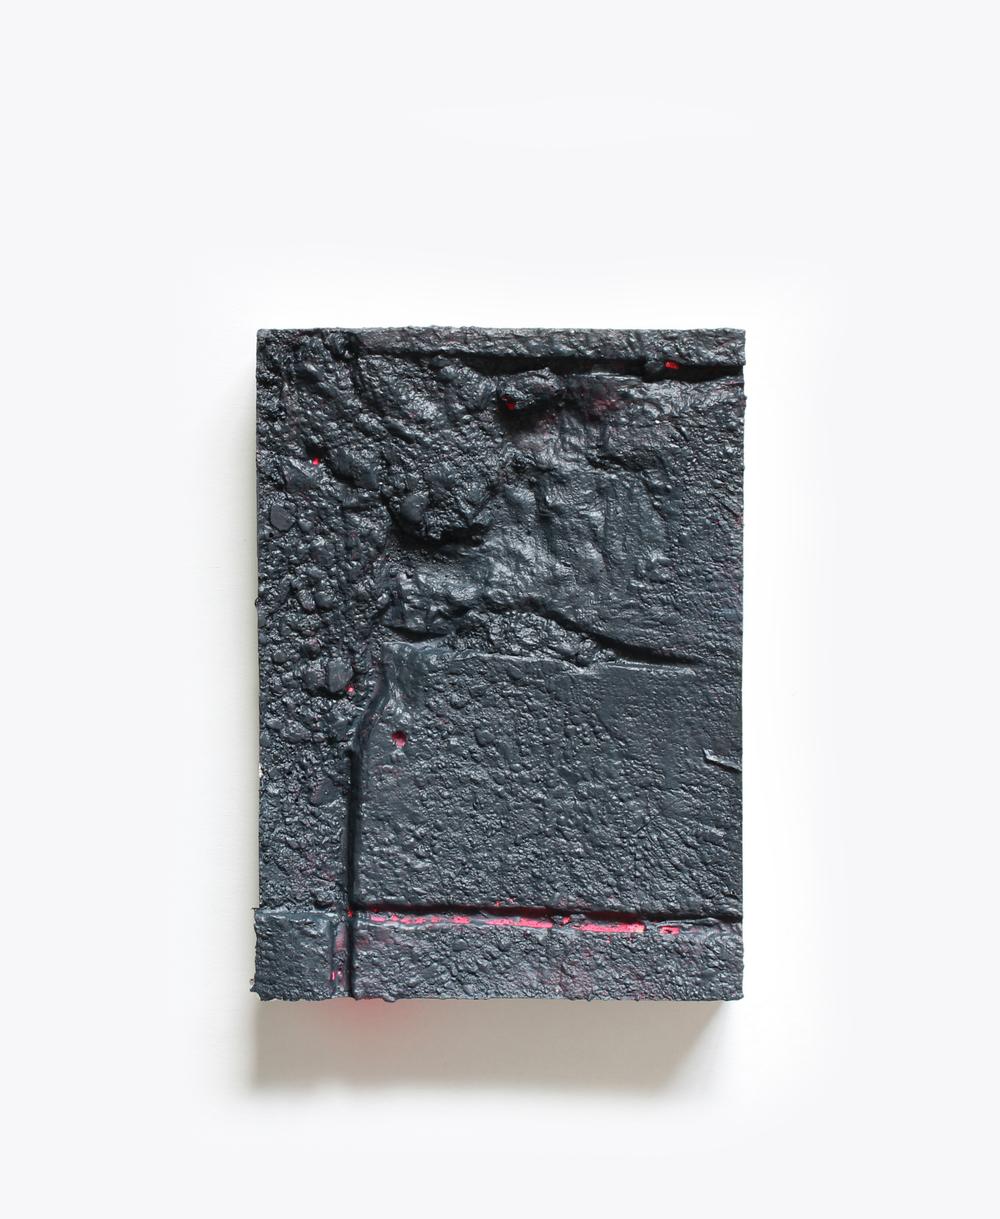 Elise  no. 12  Acrylic and spray paint on plaster  13cm x 18cm